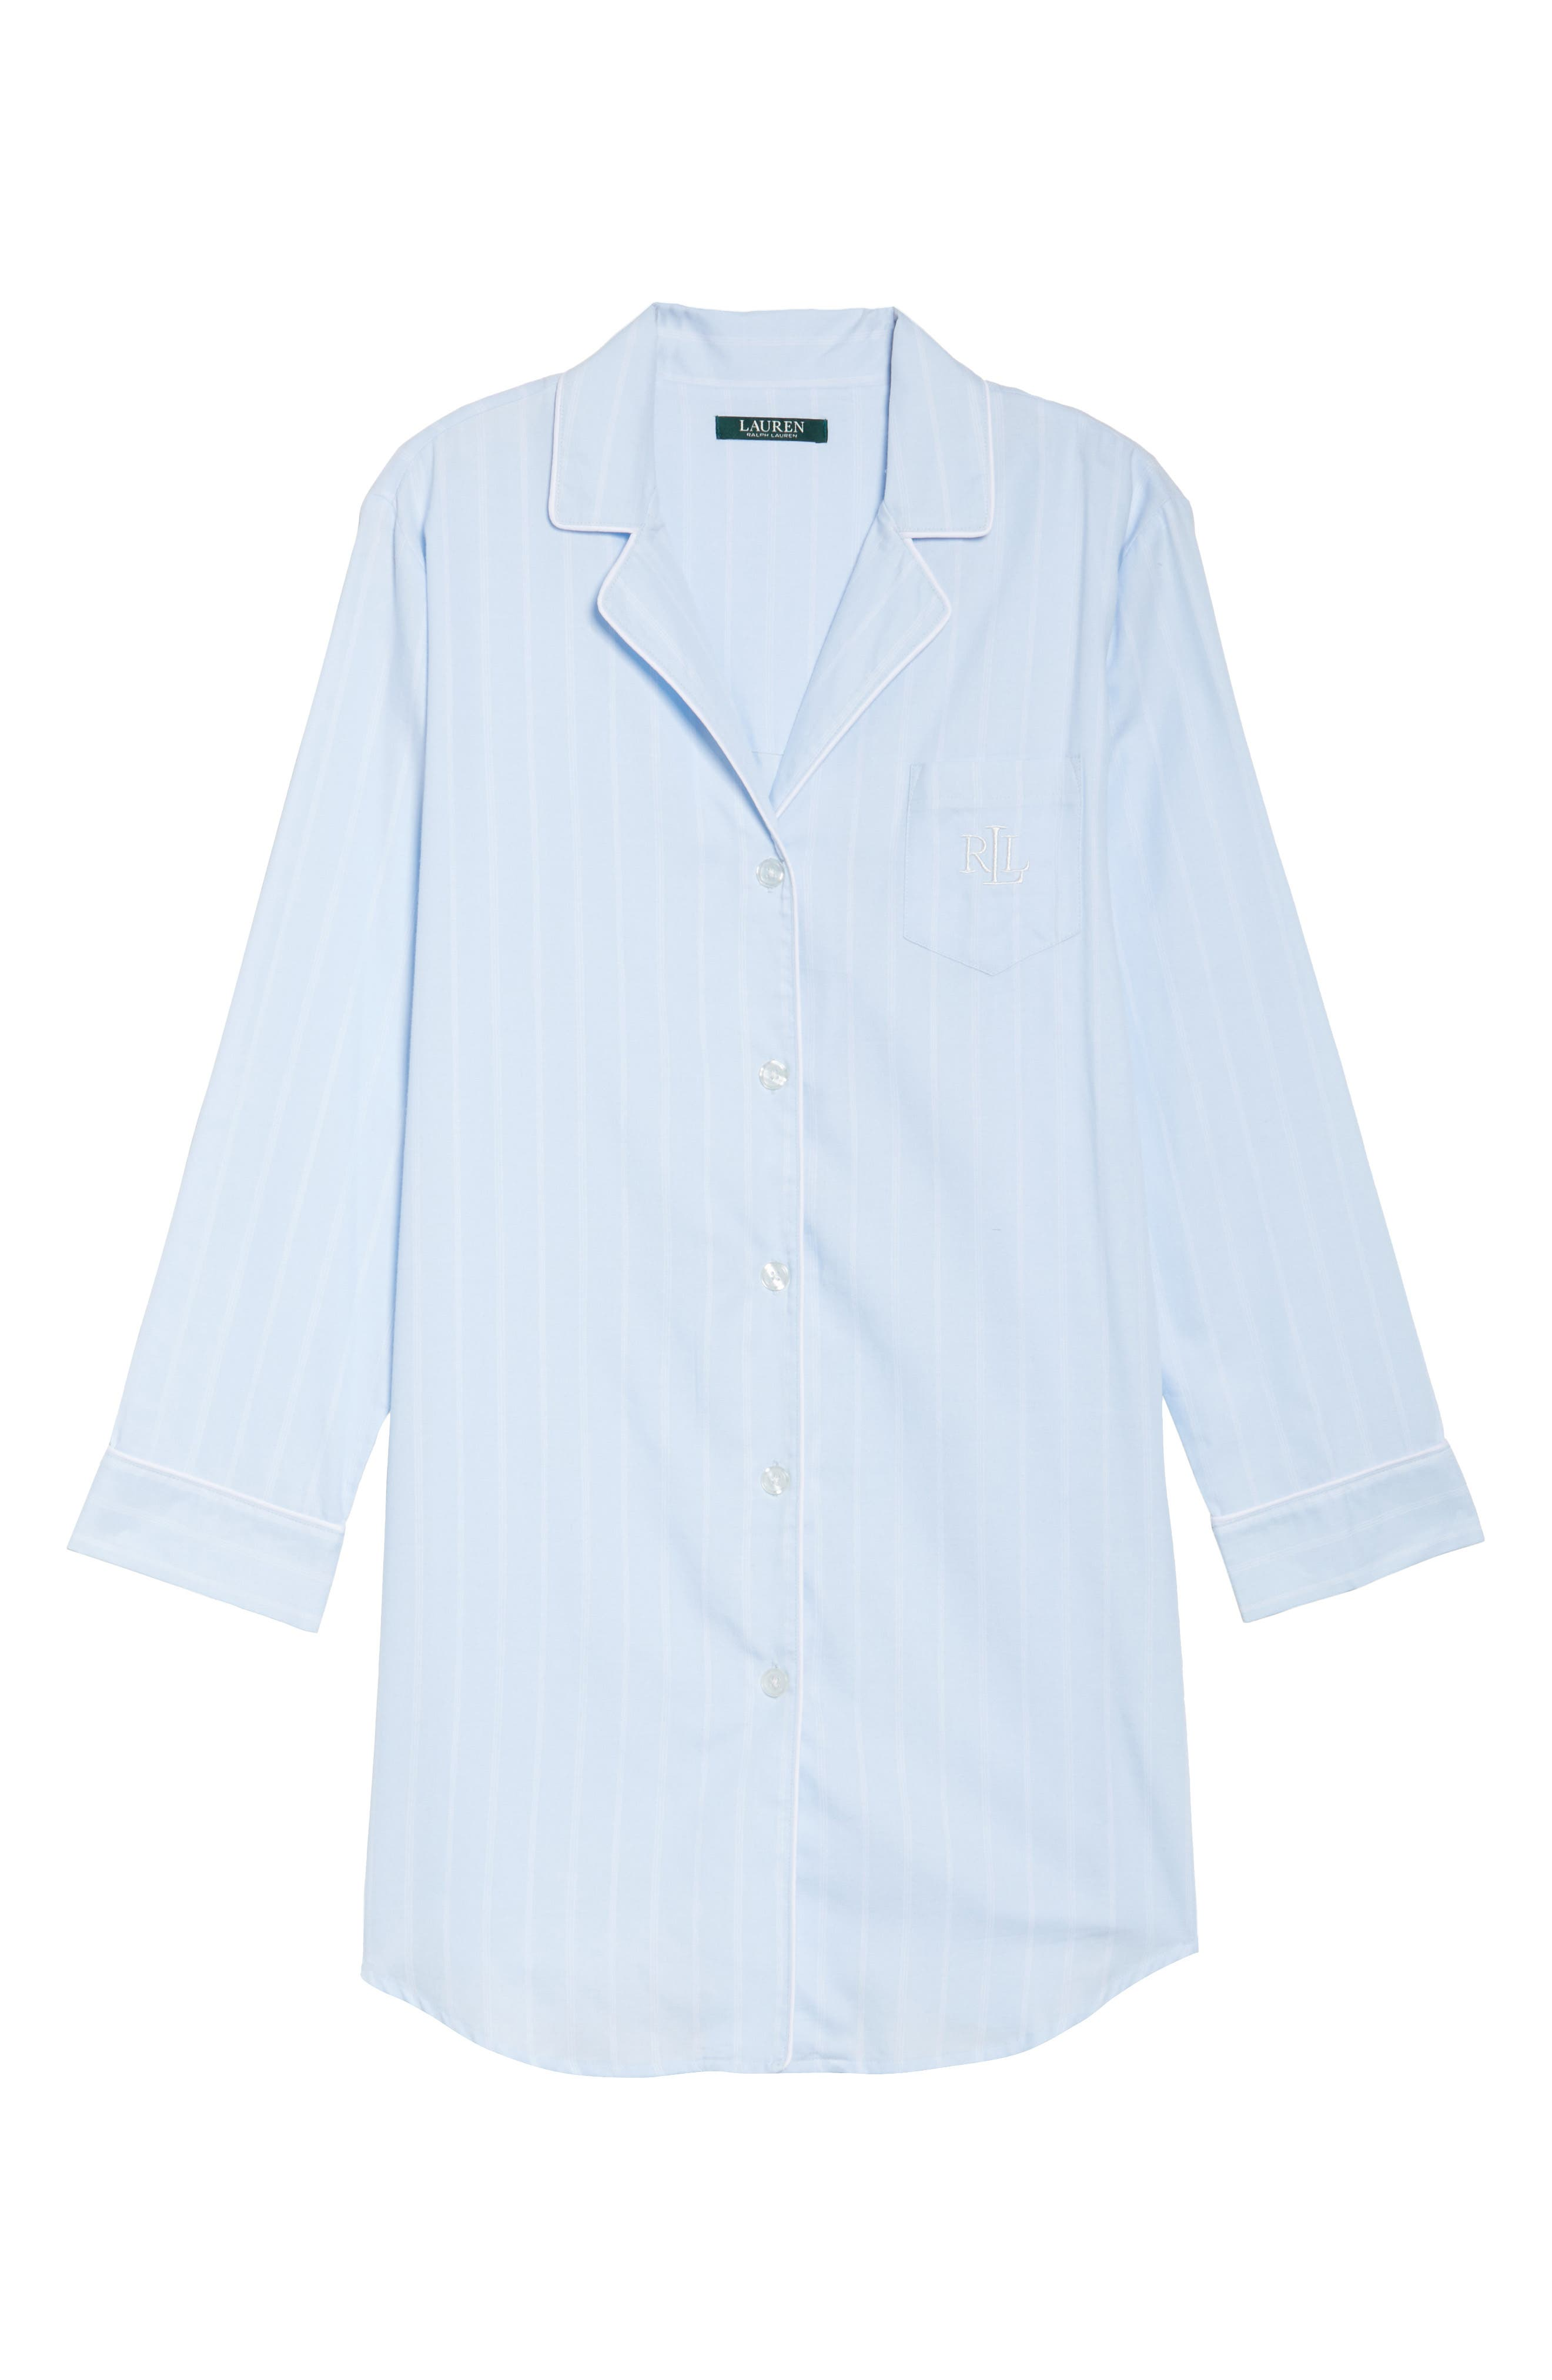 Notch Collar Sleep Shirt,                             Alternate thumbnail 6, color,                             Blue Pin Stripe